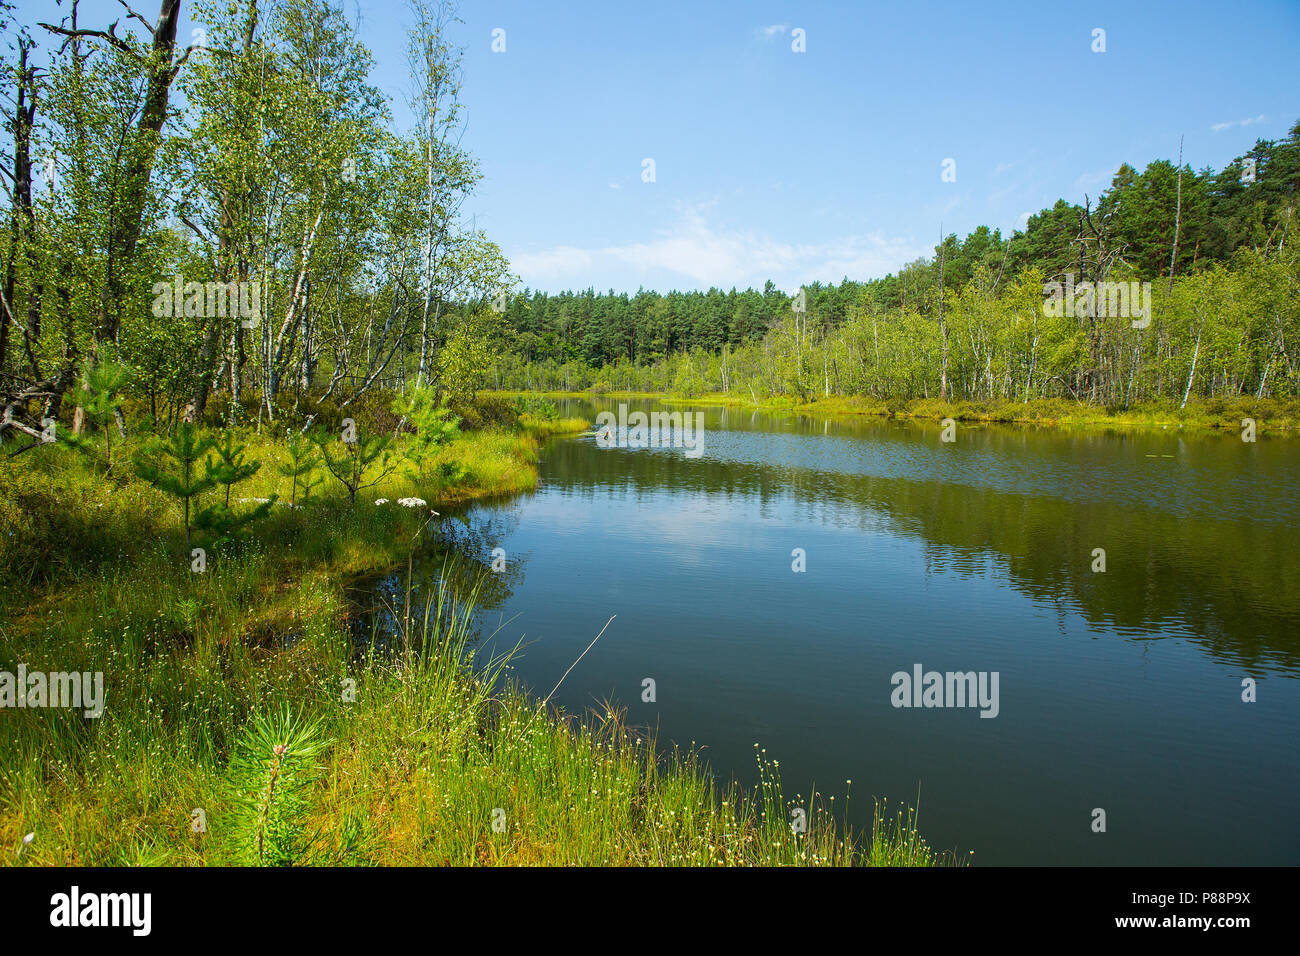 Vennen omgeving van Rheinsberg, Fens near Rheinsberg Stock Photo